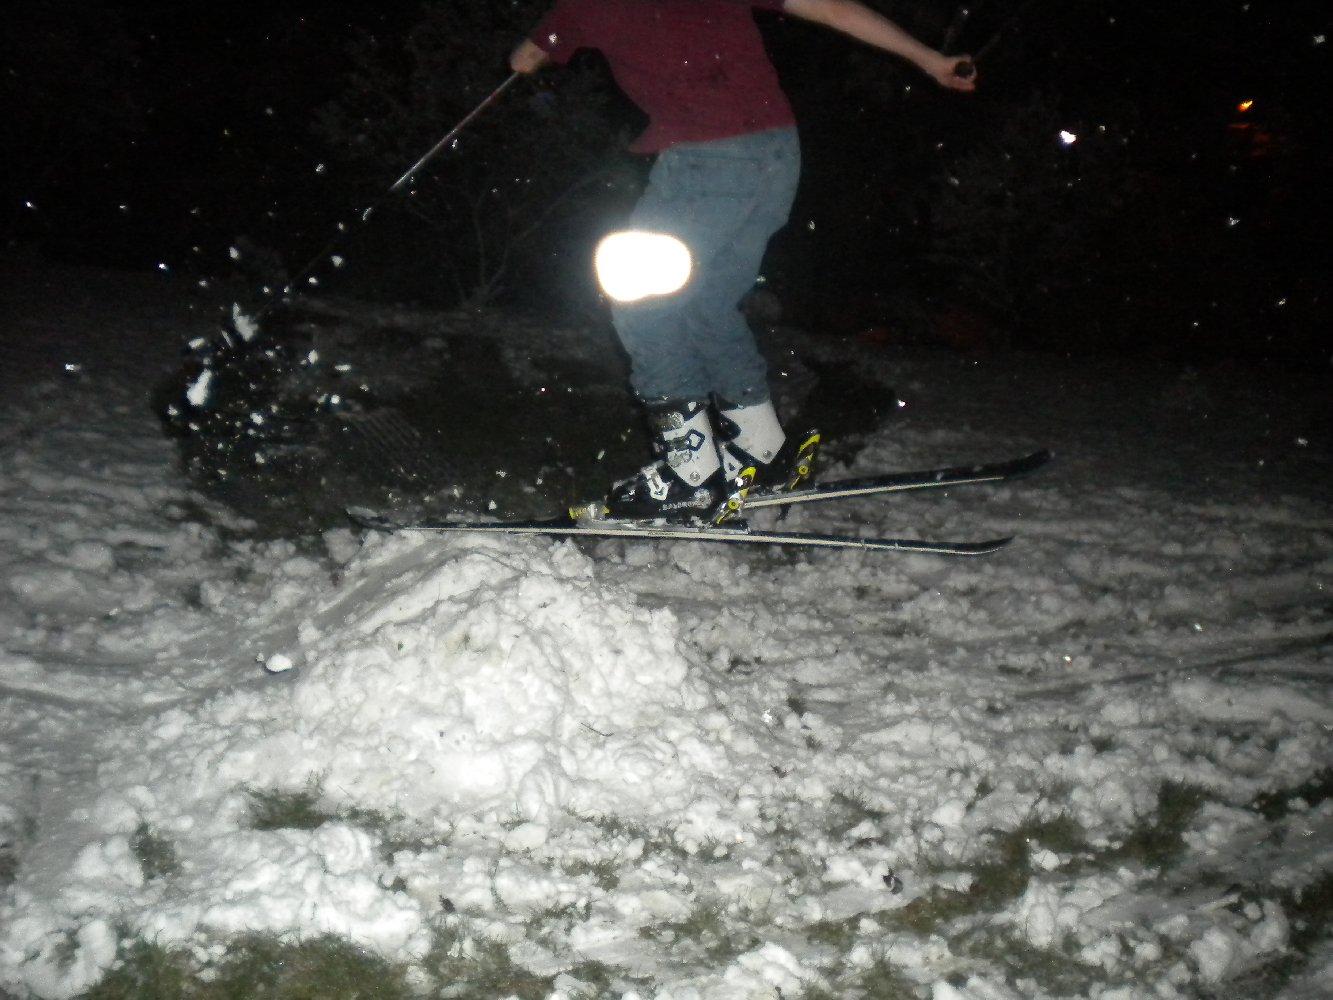 Backyard Skiing on April 18th - 22 of 27